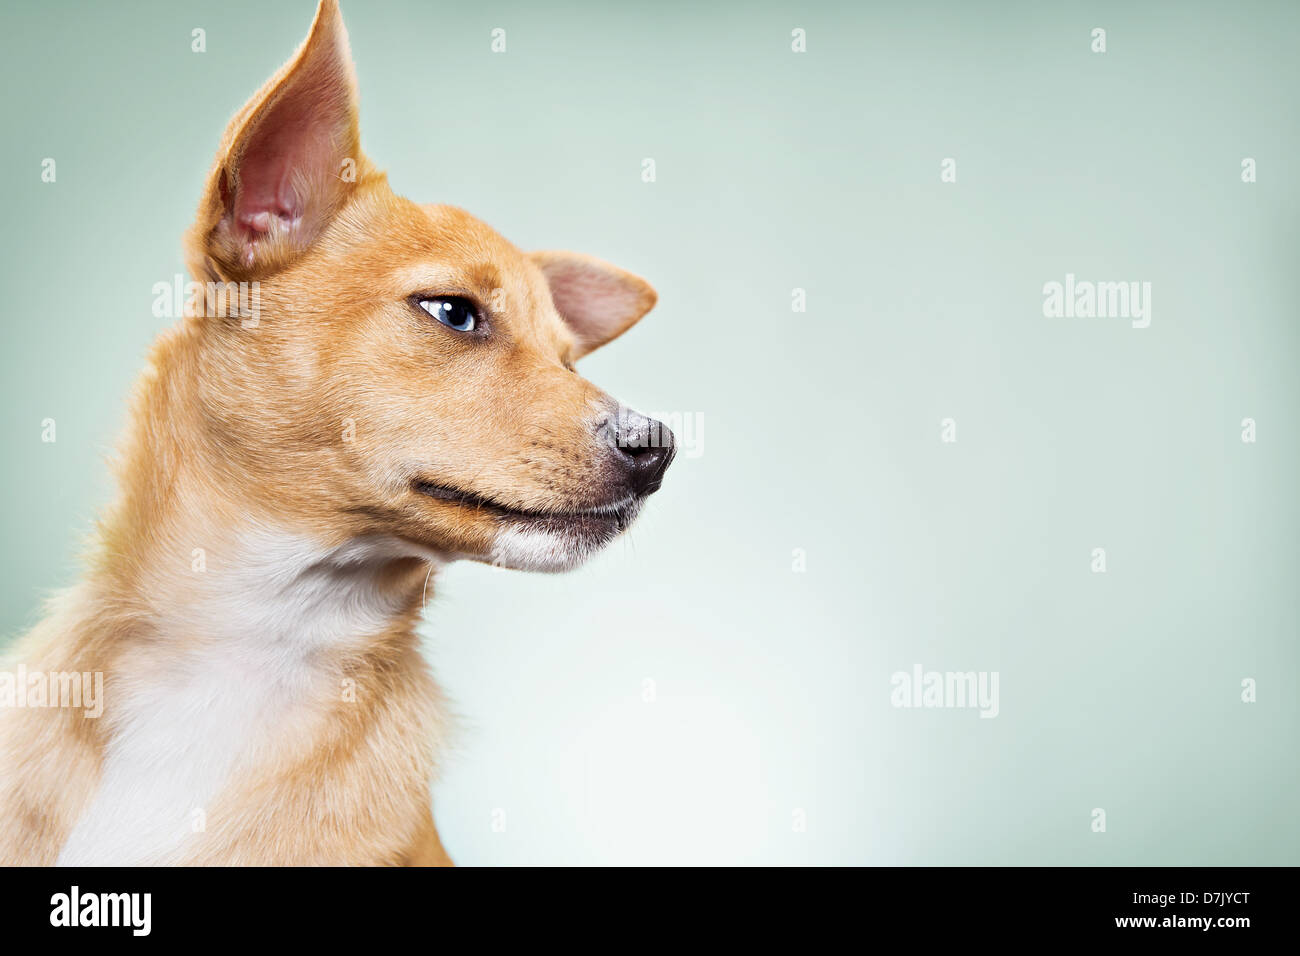 Un retrato de Basenji MIX BREED Chihuahua en studio contra el telón de fondo verde Imagen De Stock